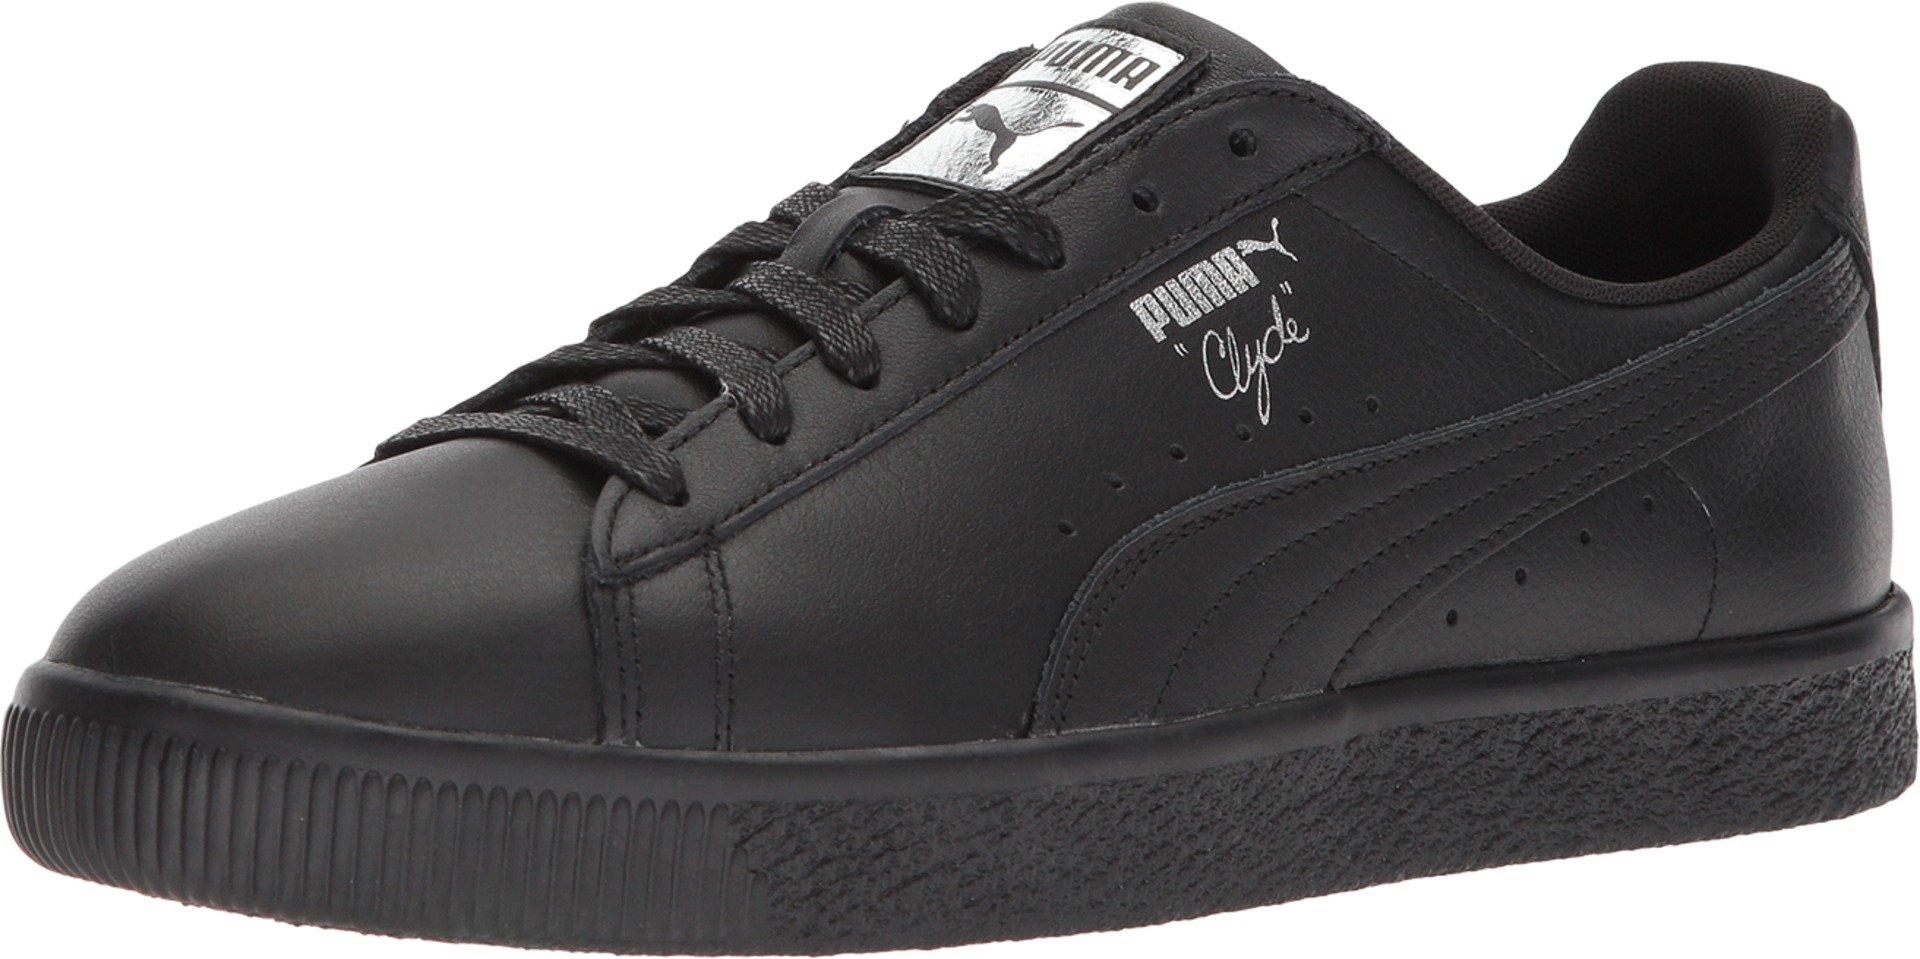 timeless design f1ec4 2b5ff Puma 364669-06: Men's Clyde Black/Silver Leather Vulcanized Sneakers (12  D(M) US Men)